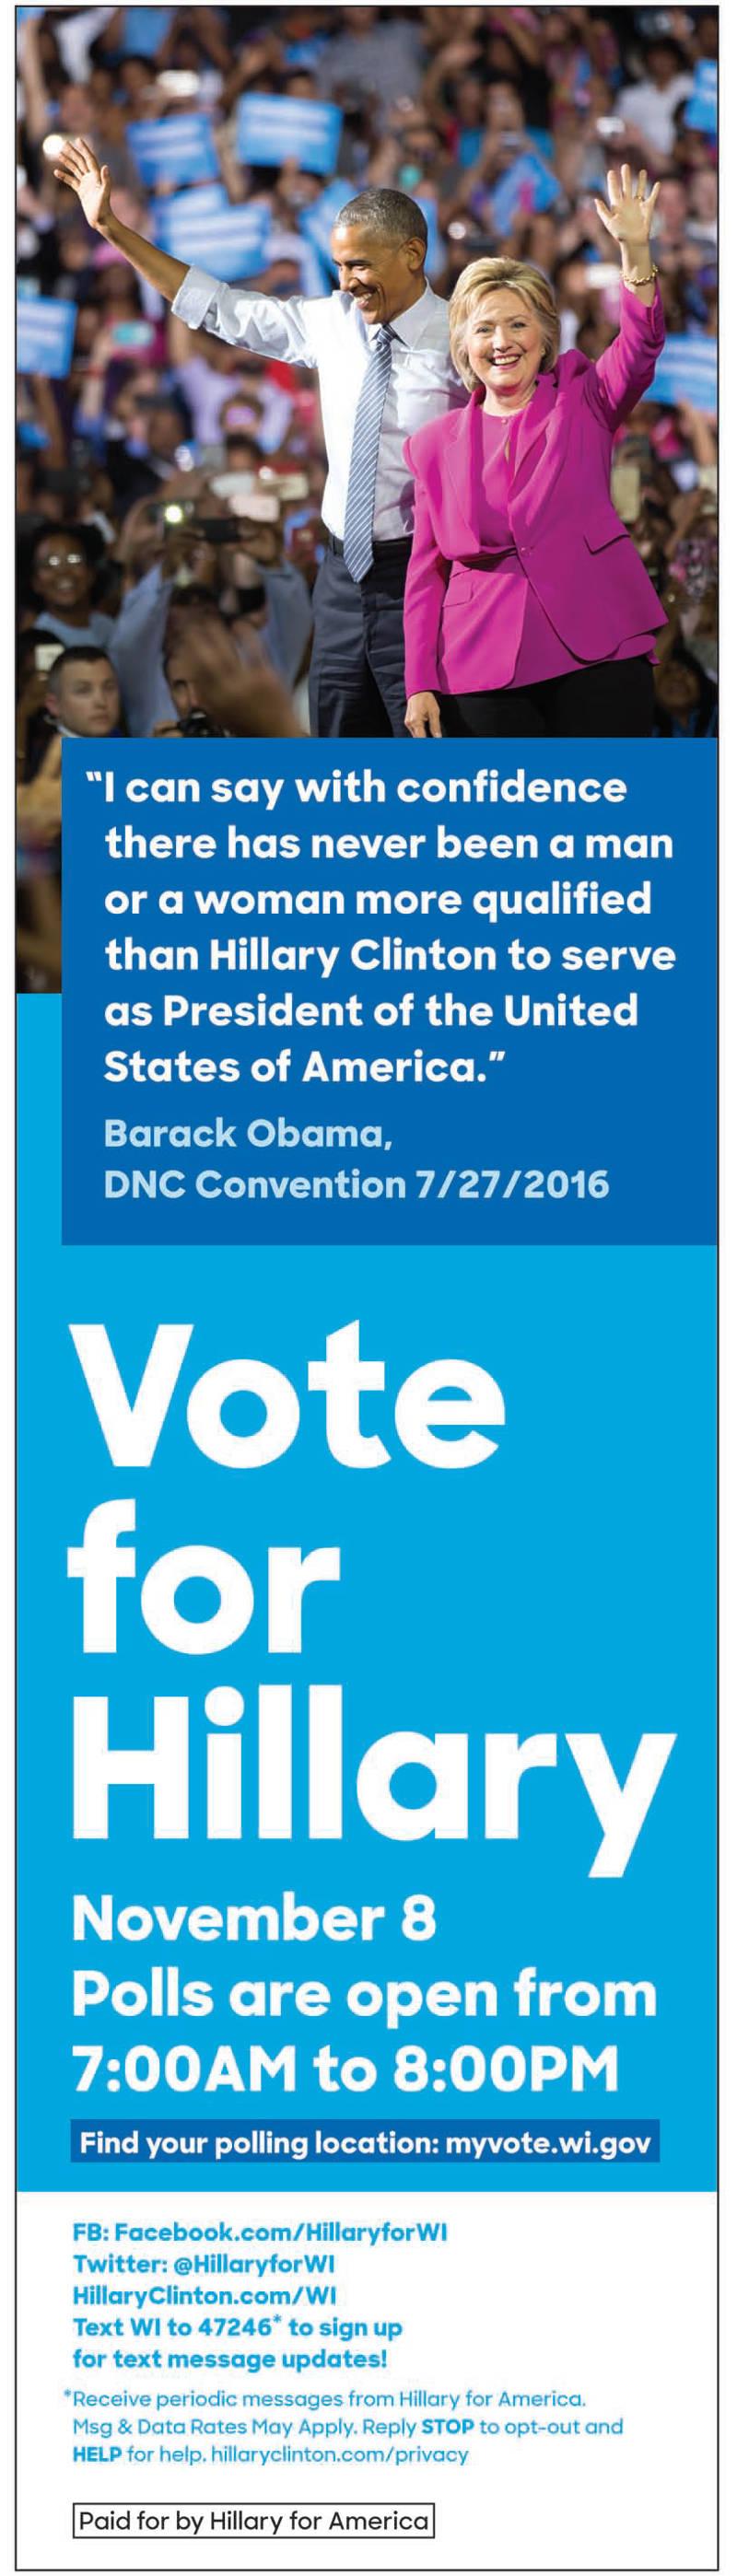 vote-for-hillary-november-8th